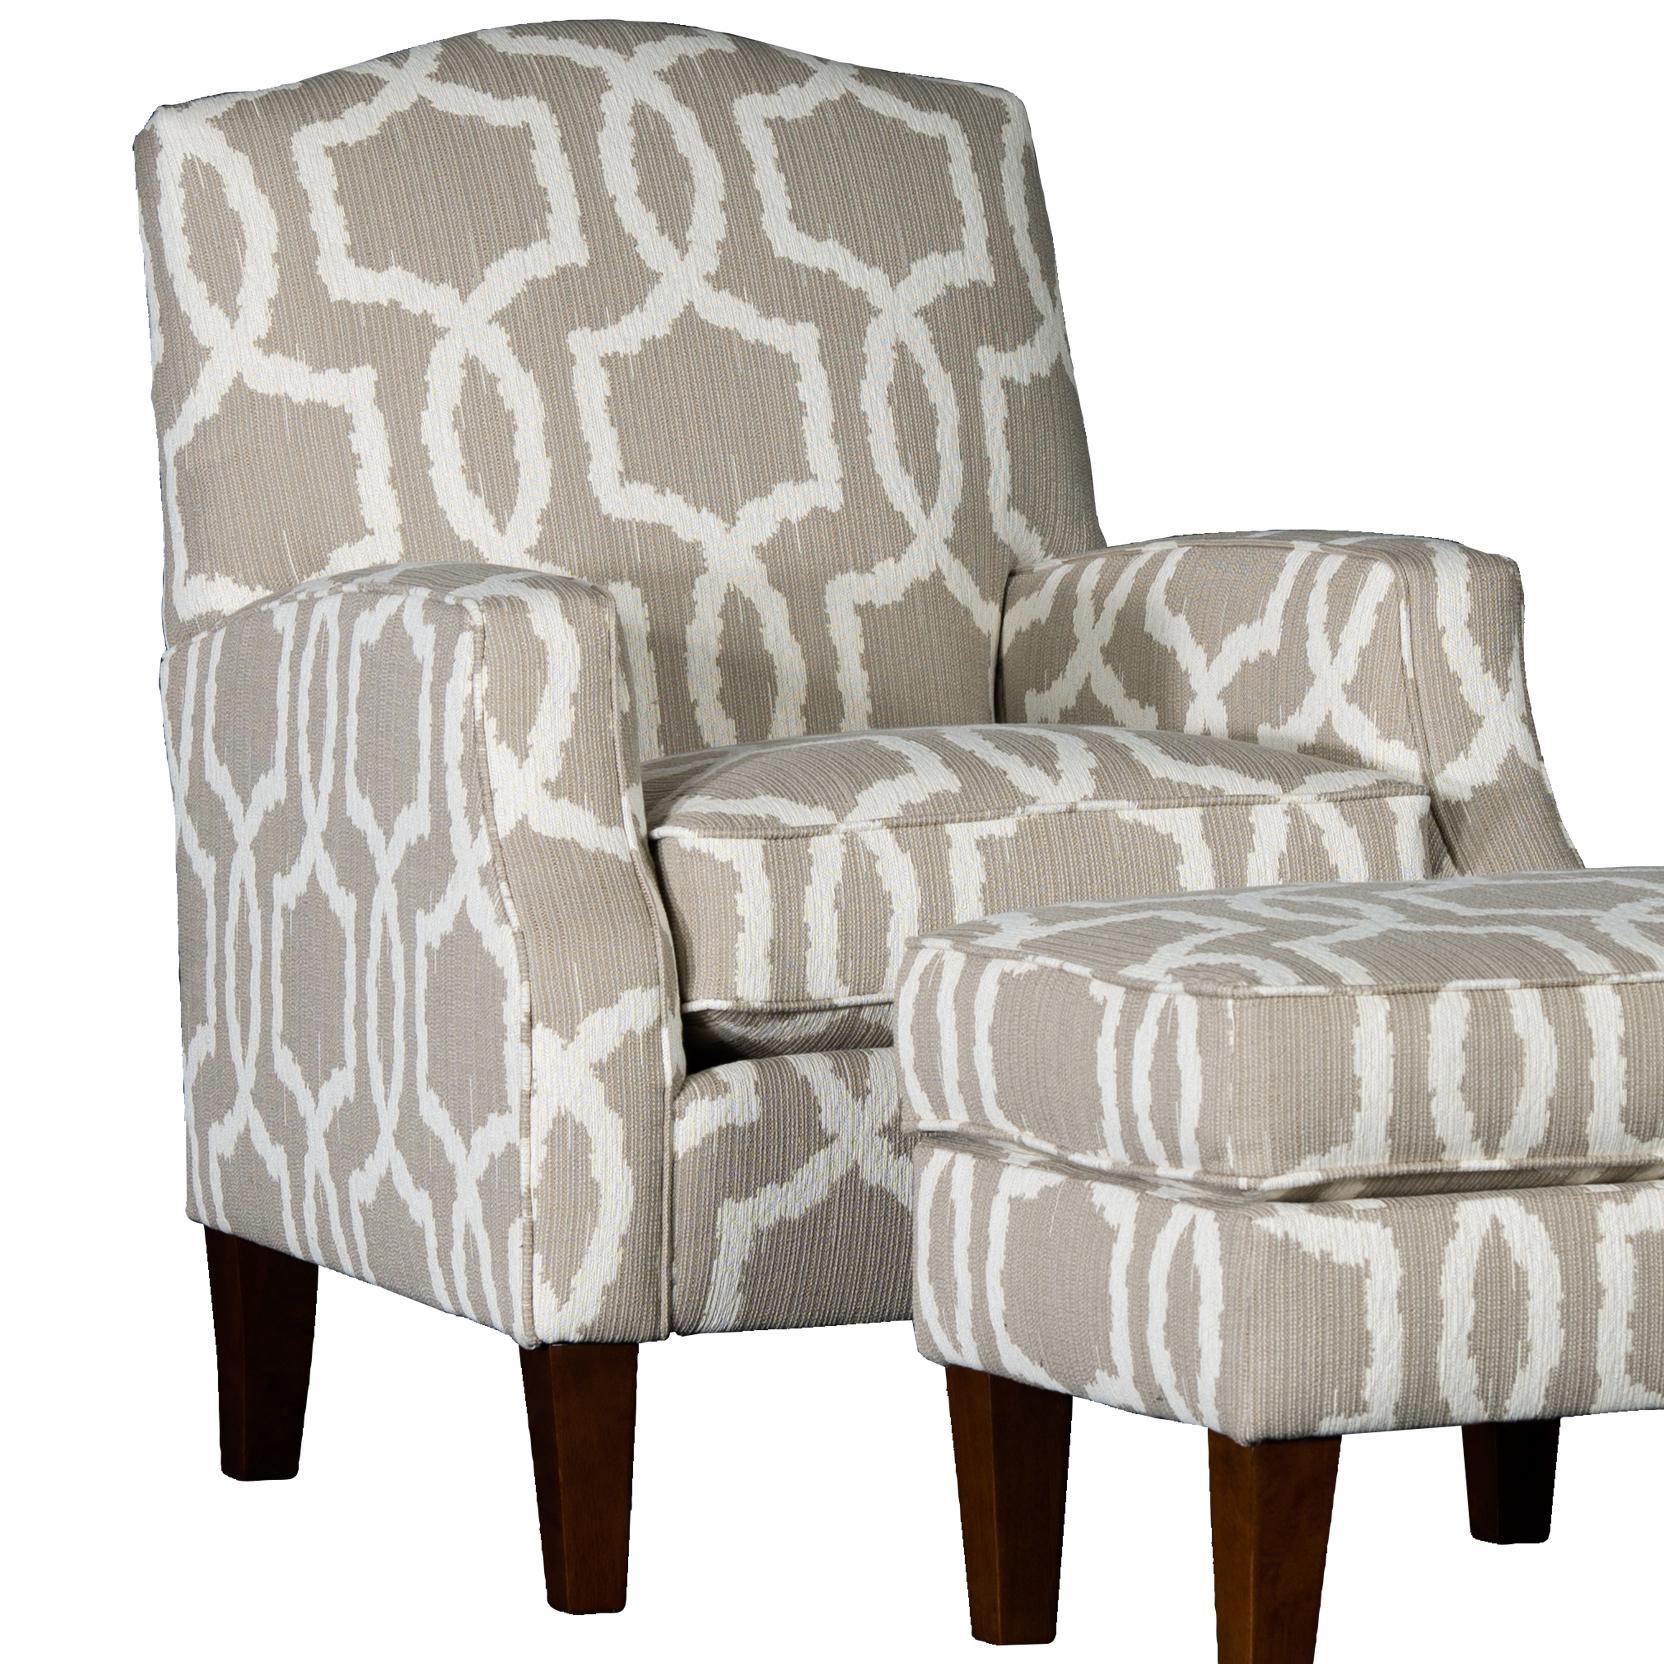 3725 Chair by Mayo at Pedigo Furniture